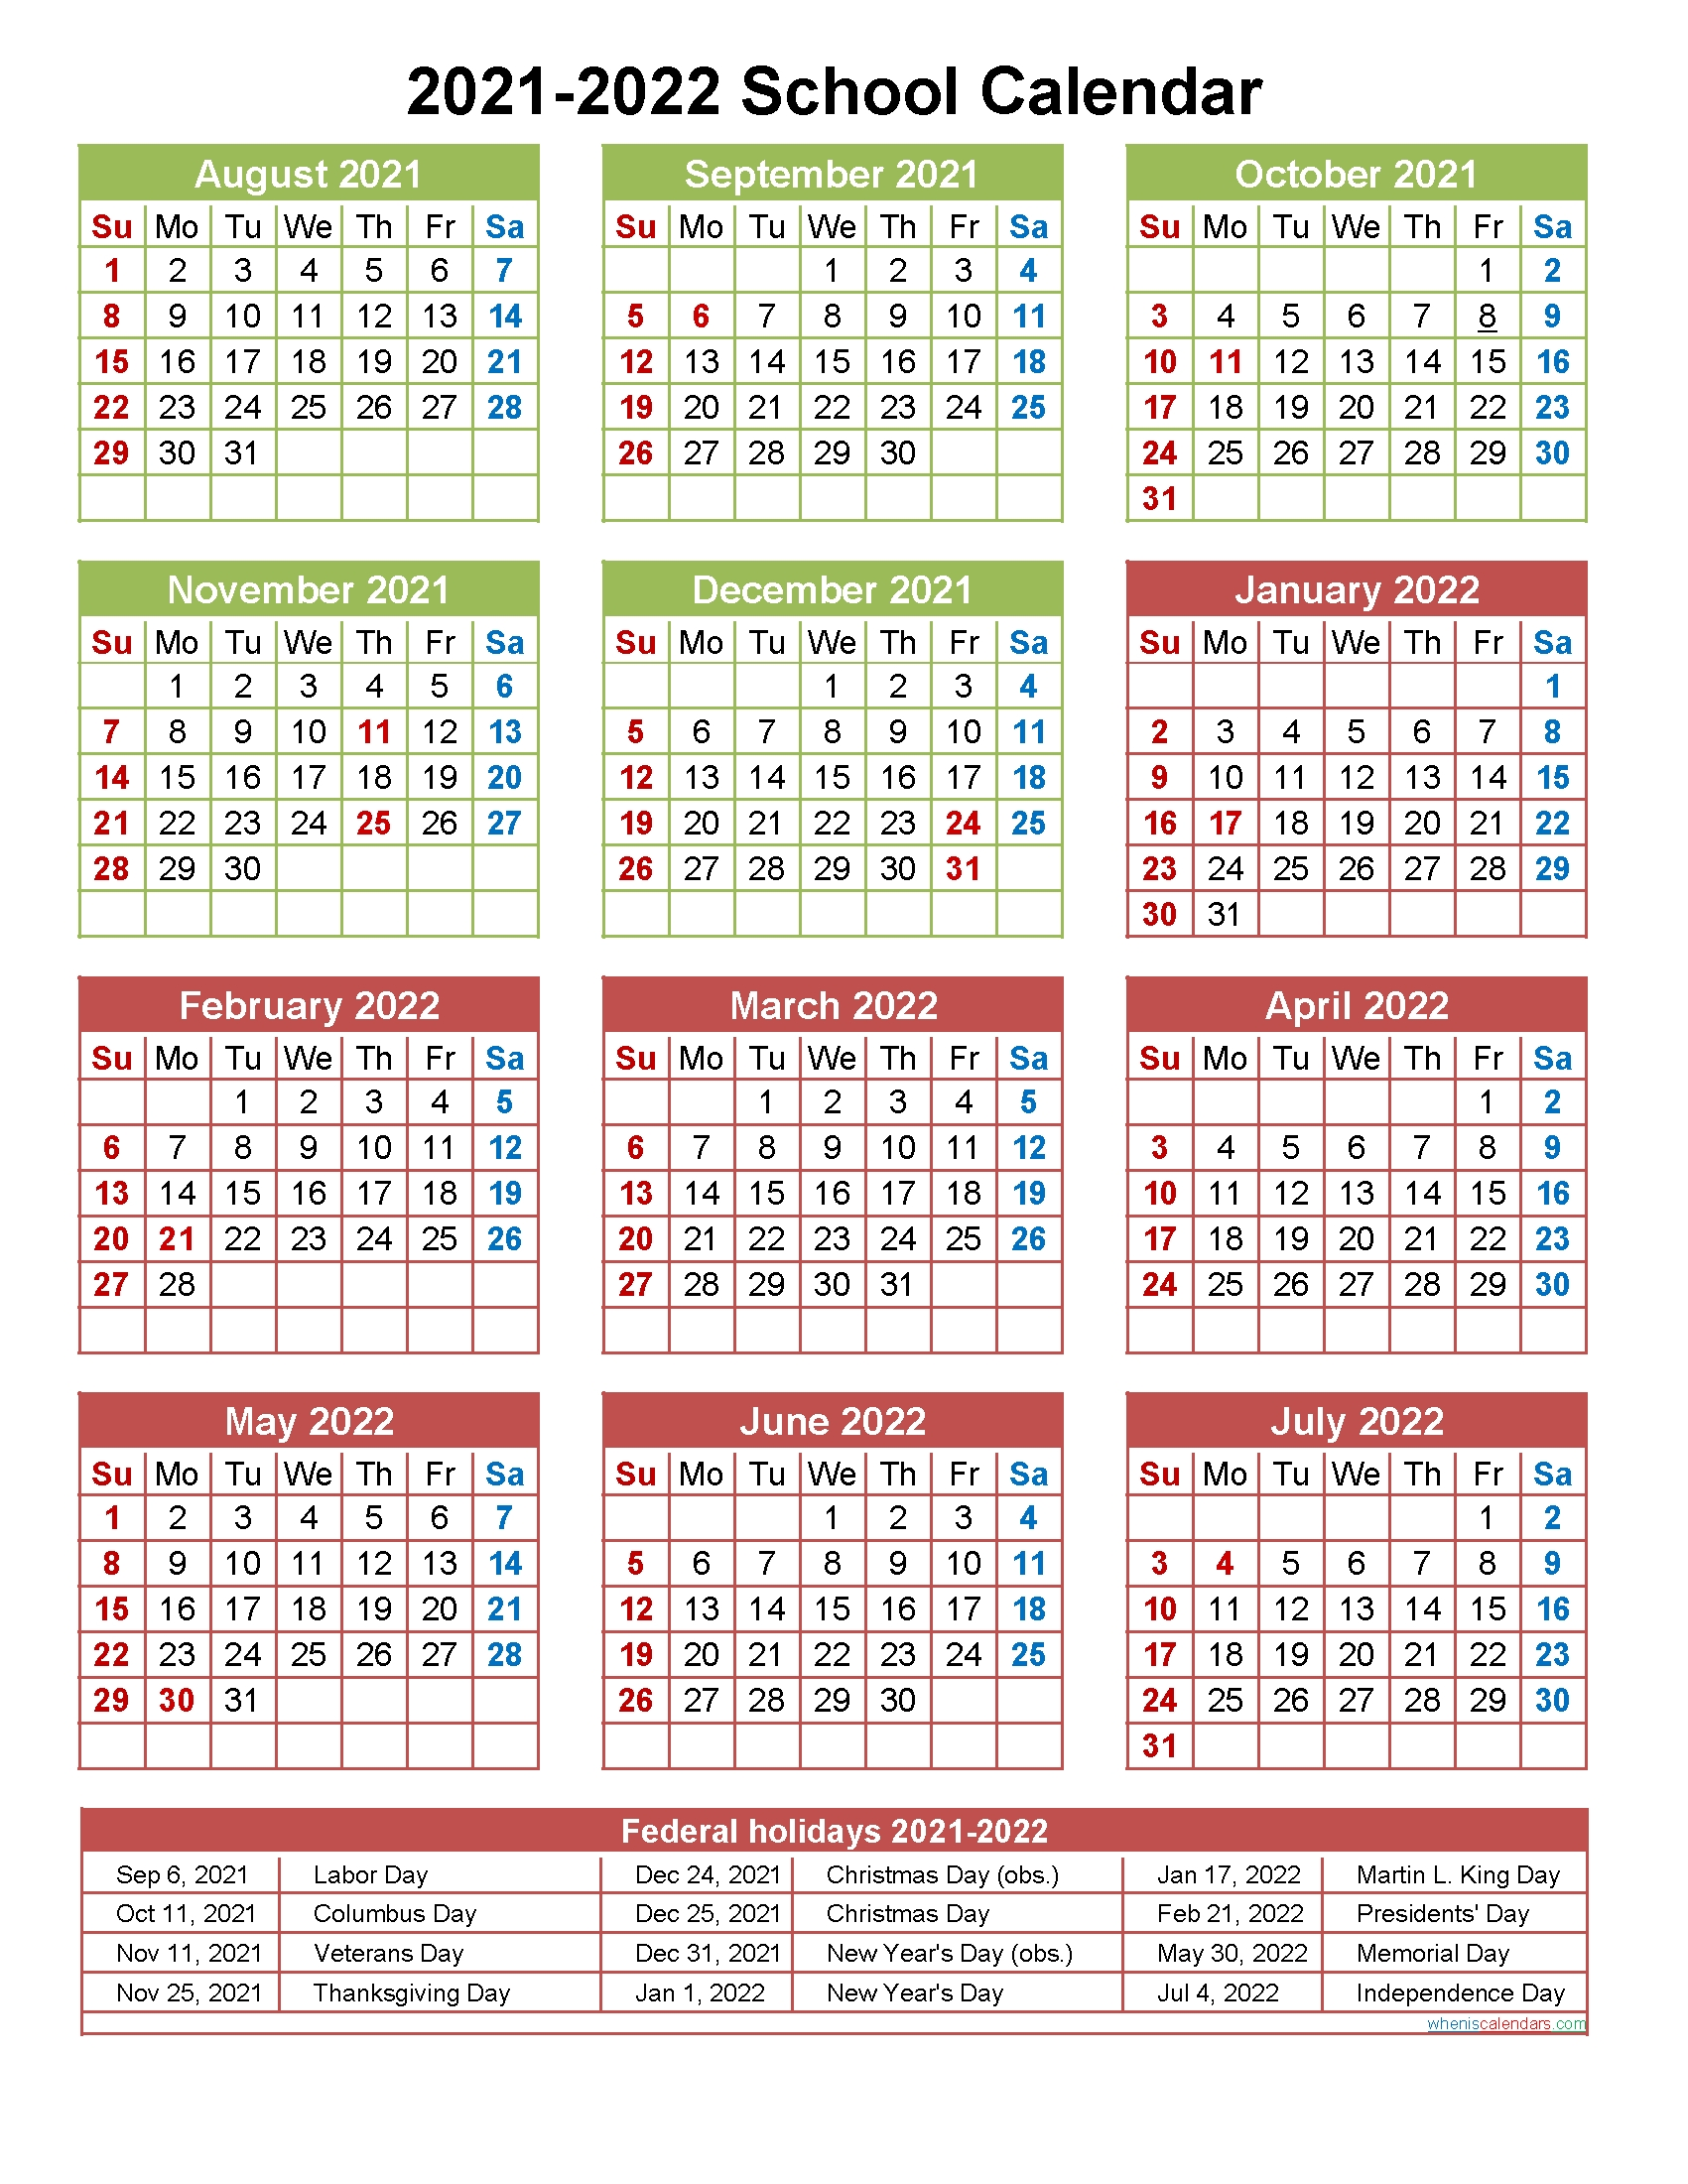 2021 And 2022 School Calendar Printable (Portrait